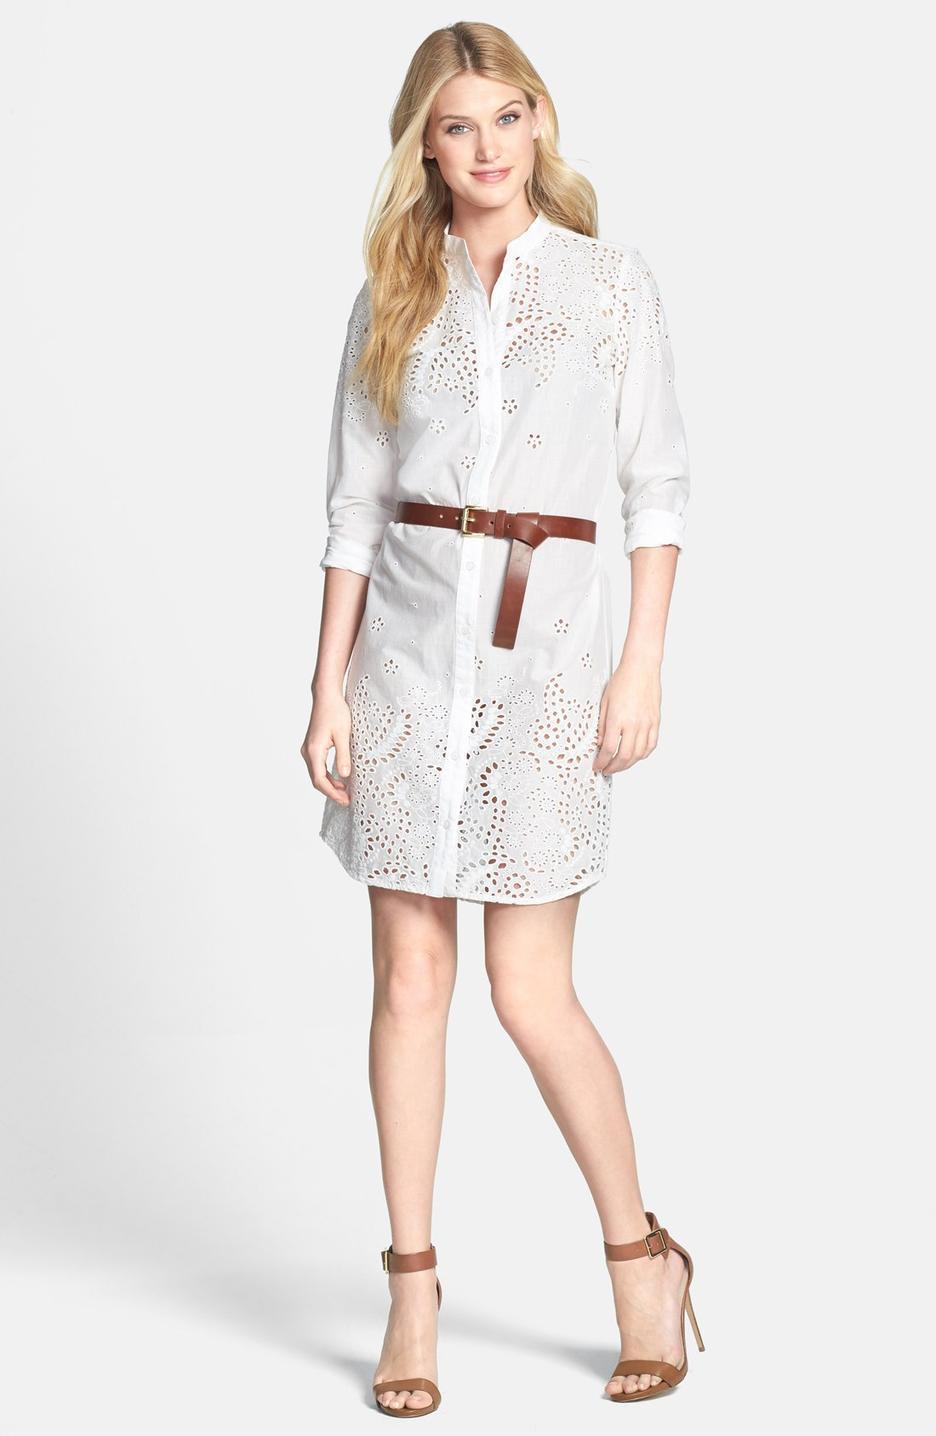 white-dress-cognac-shoe-sandalh-belt-shirt-wear-style-fashion-spring-summer-office-outfit-blonde-work.jpg